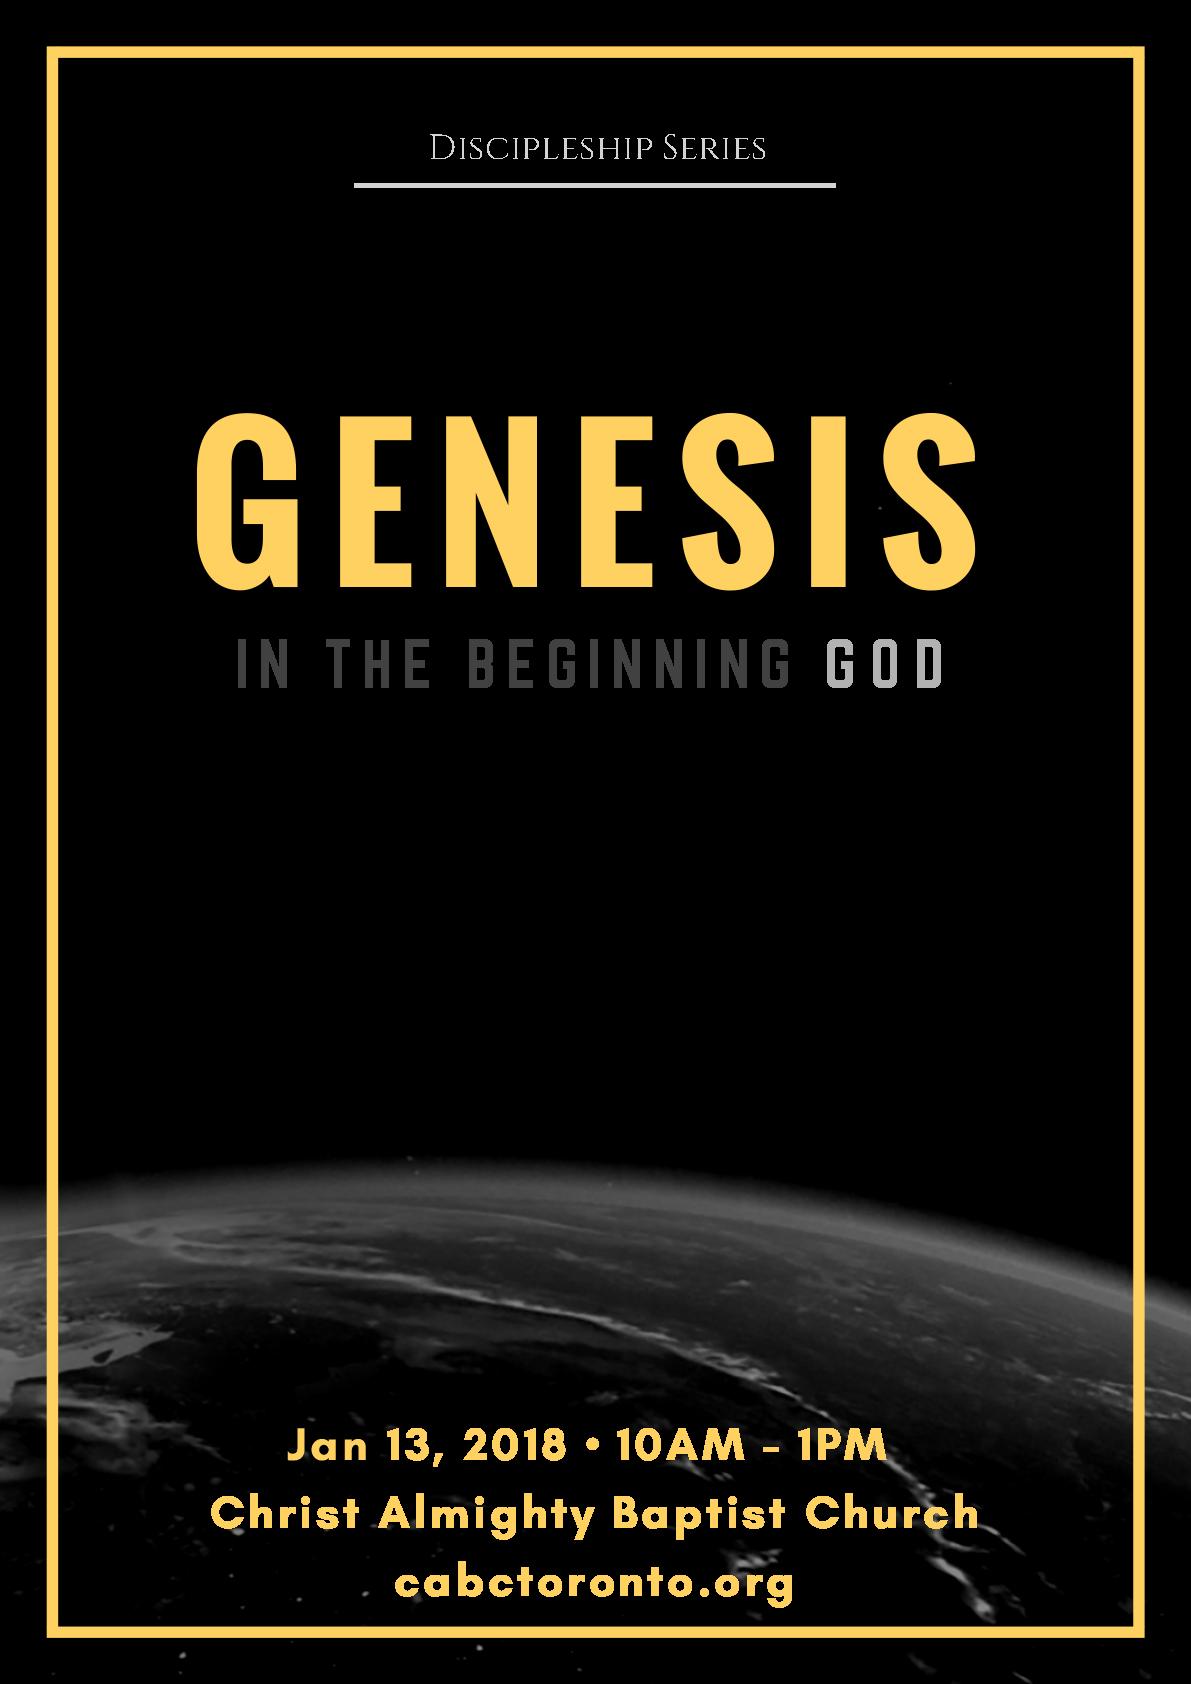 CABC-DiscipleshipSeries2018-Genesis.jpg